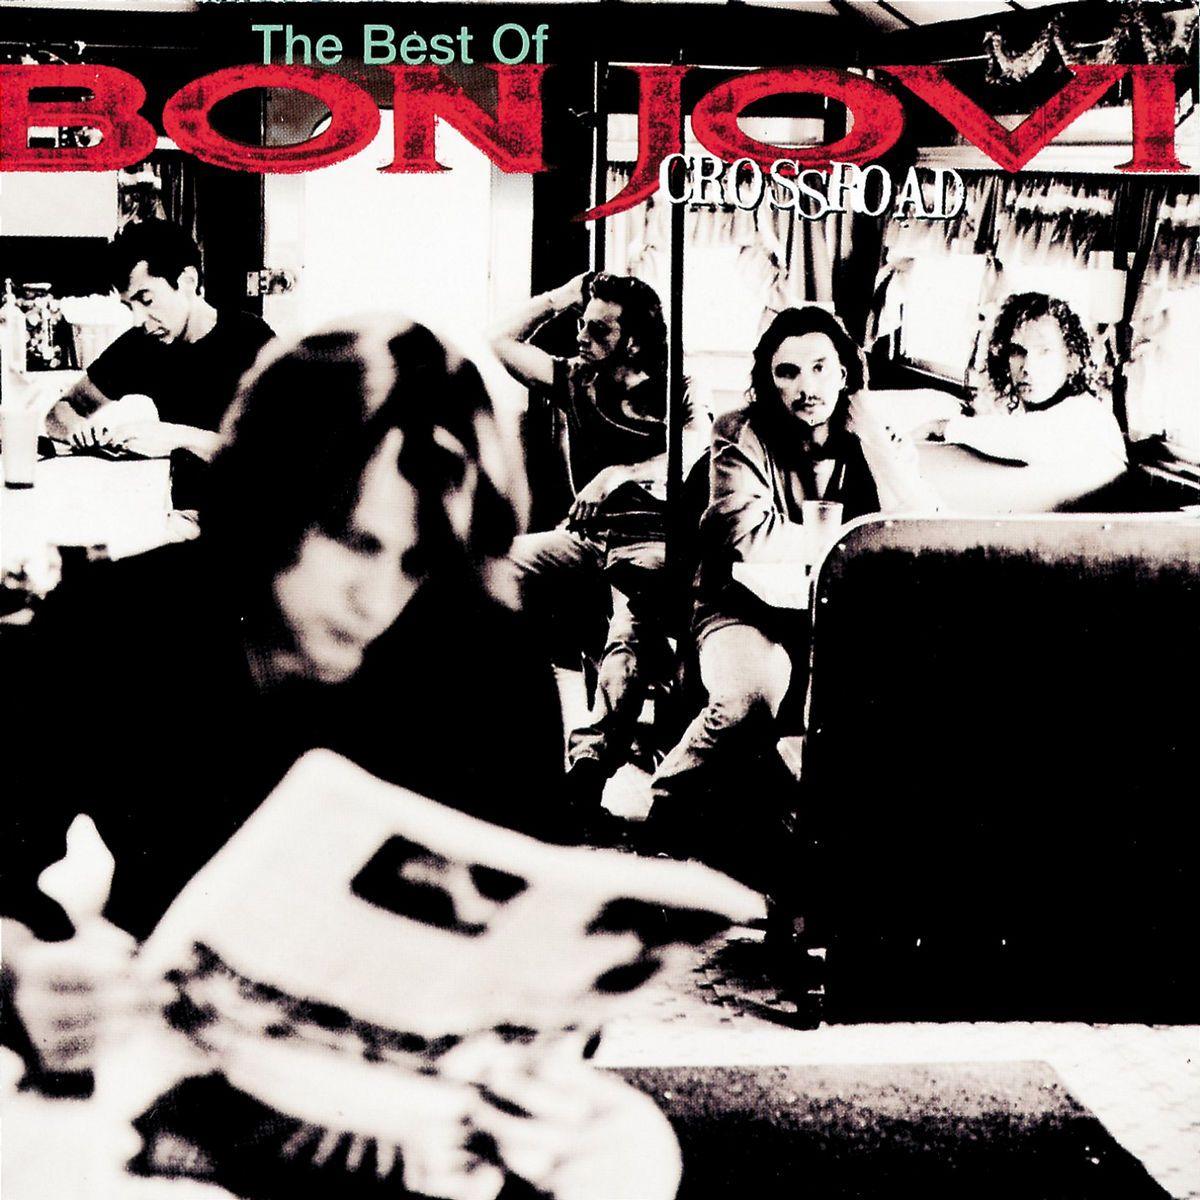 bon_jovi-crossroad_-_the_best_of_bon_jovi_a.jpg